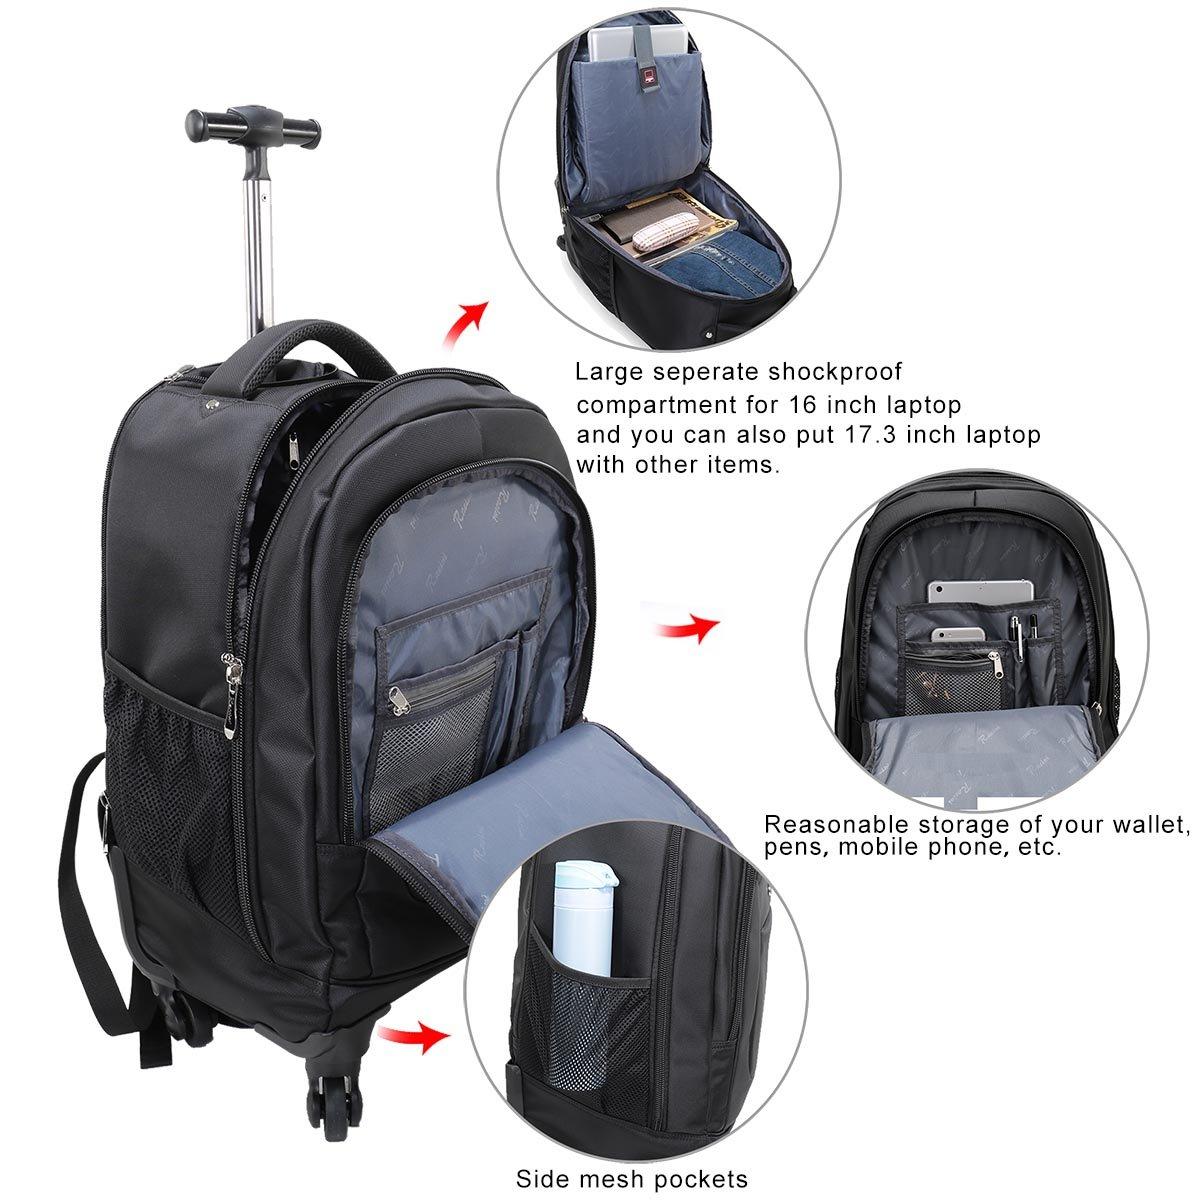 Racini Nylon Waterproof Rolling Backpack, Freewheel Travel School Wheeled Backpack, Carry-on Luggage with Anti-theft Zippers (Black) by Racini (Image #3)